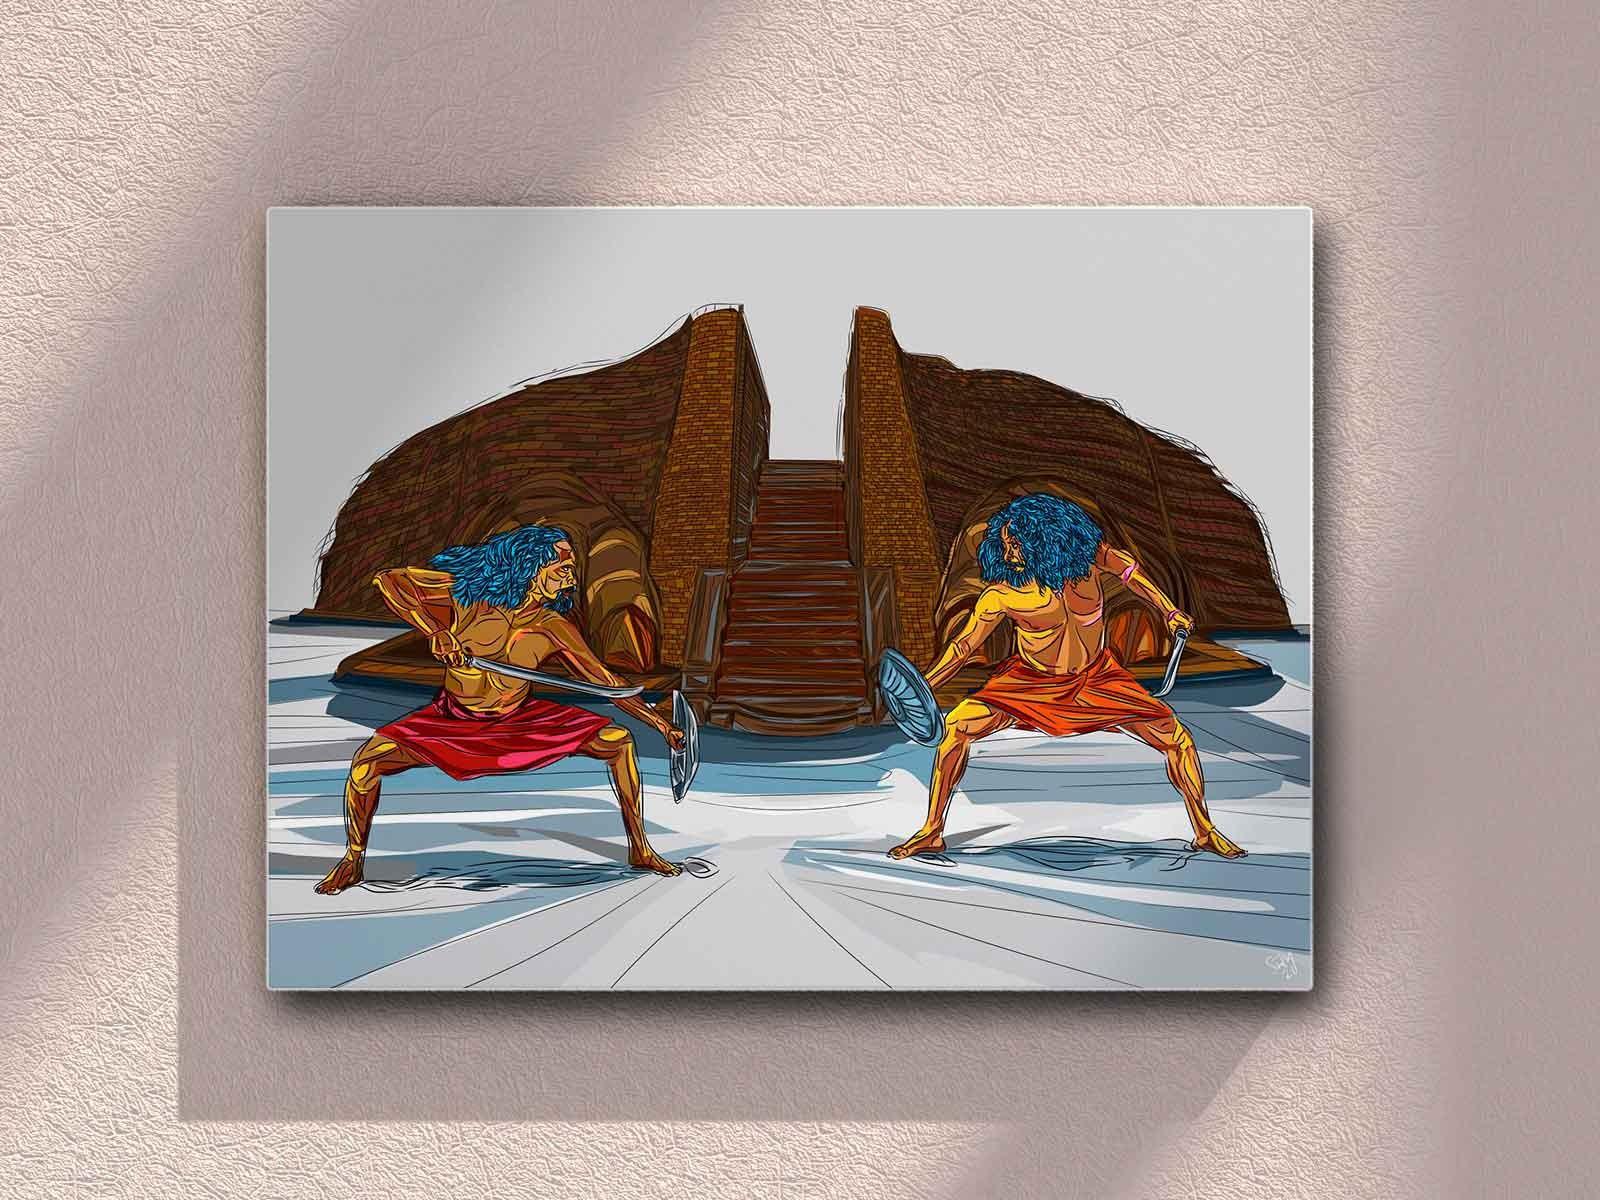 Angampora by THARINDU SAMPATH SIRIWARDANA